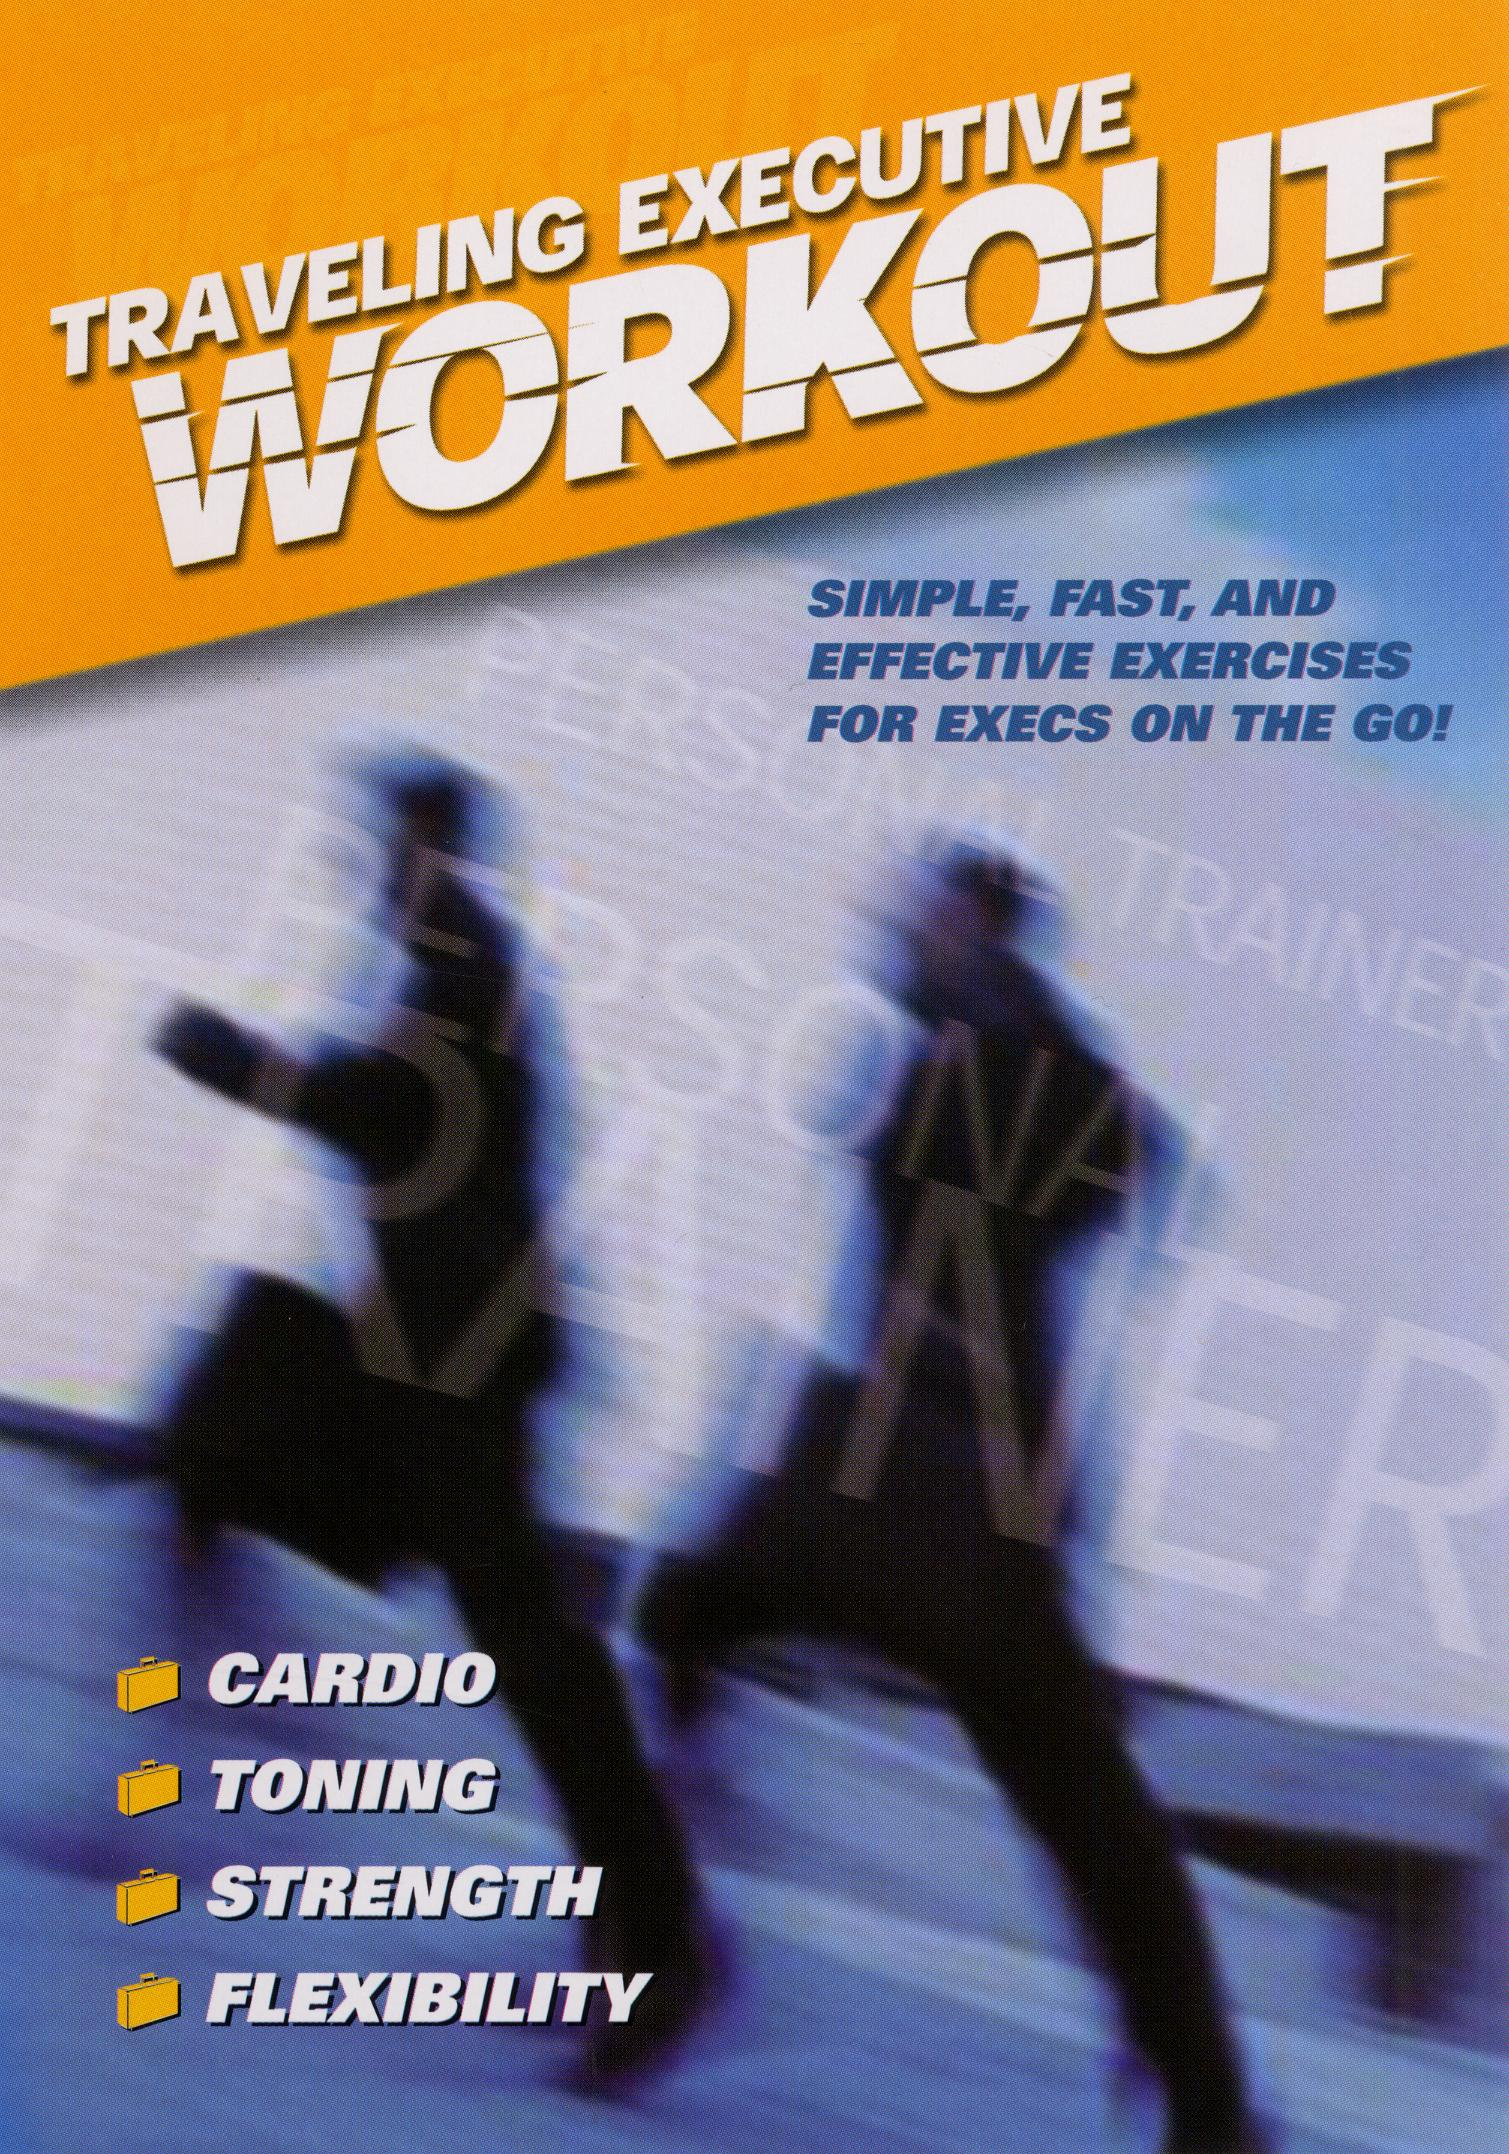 Traveling Executive Workout